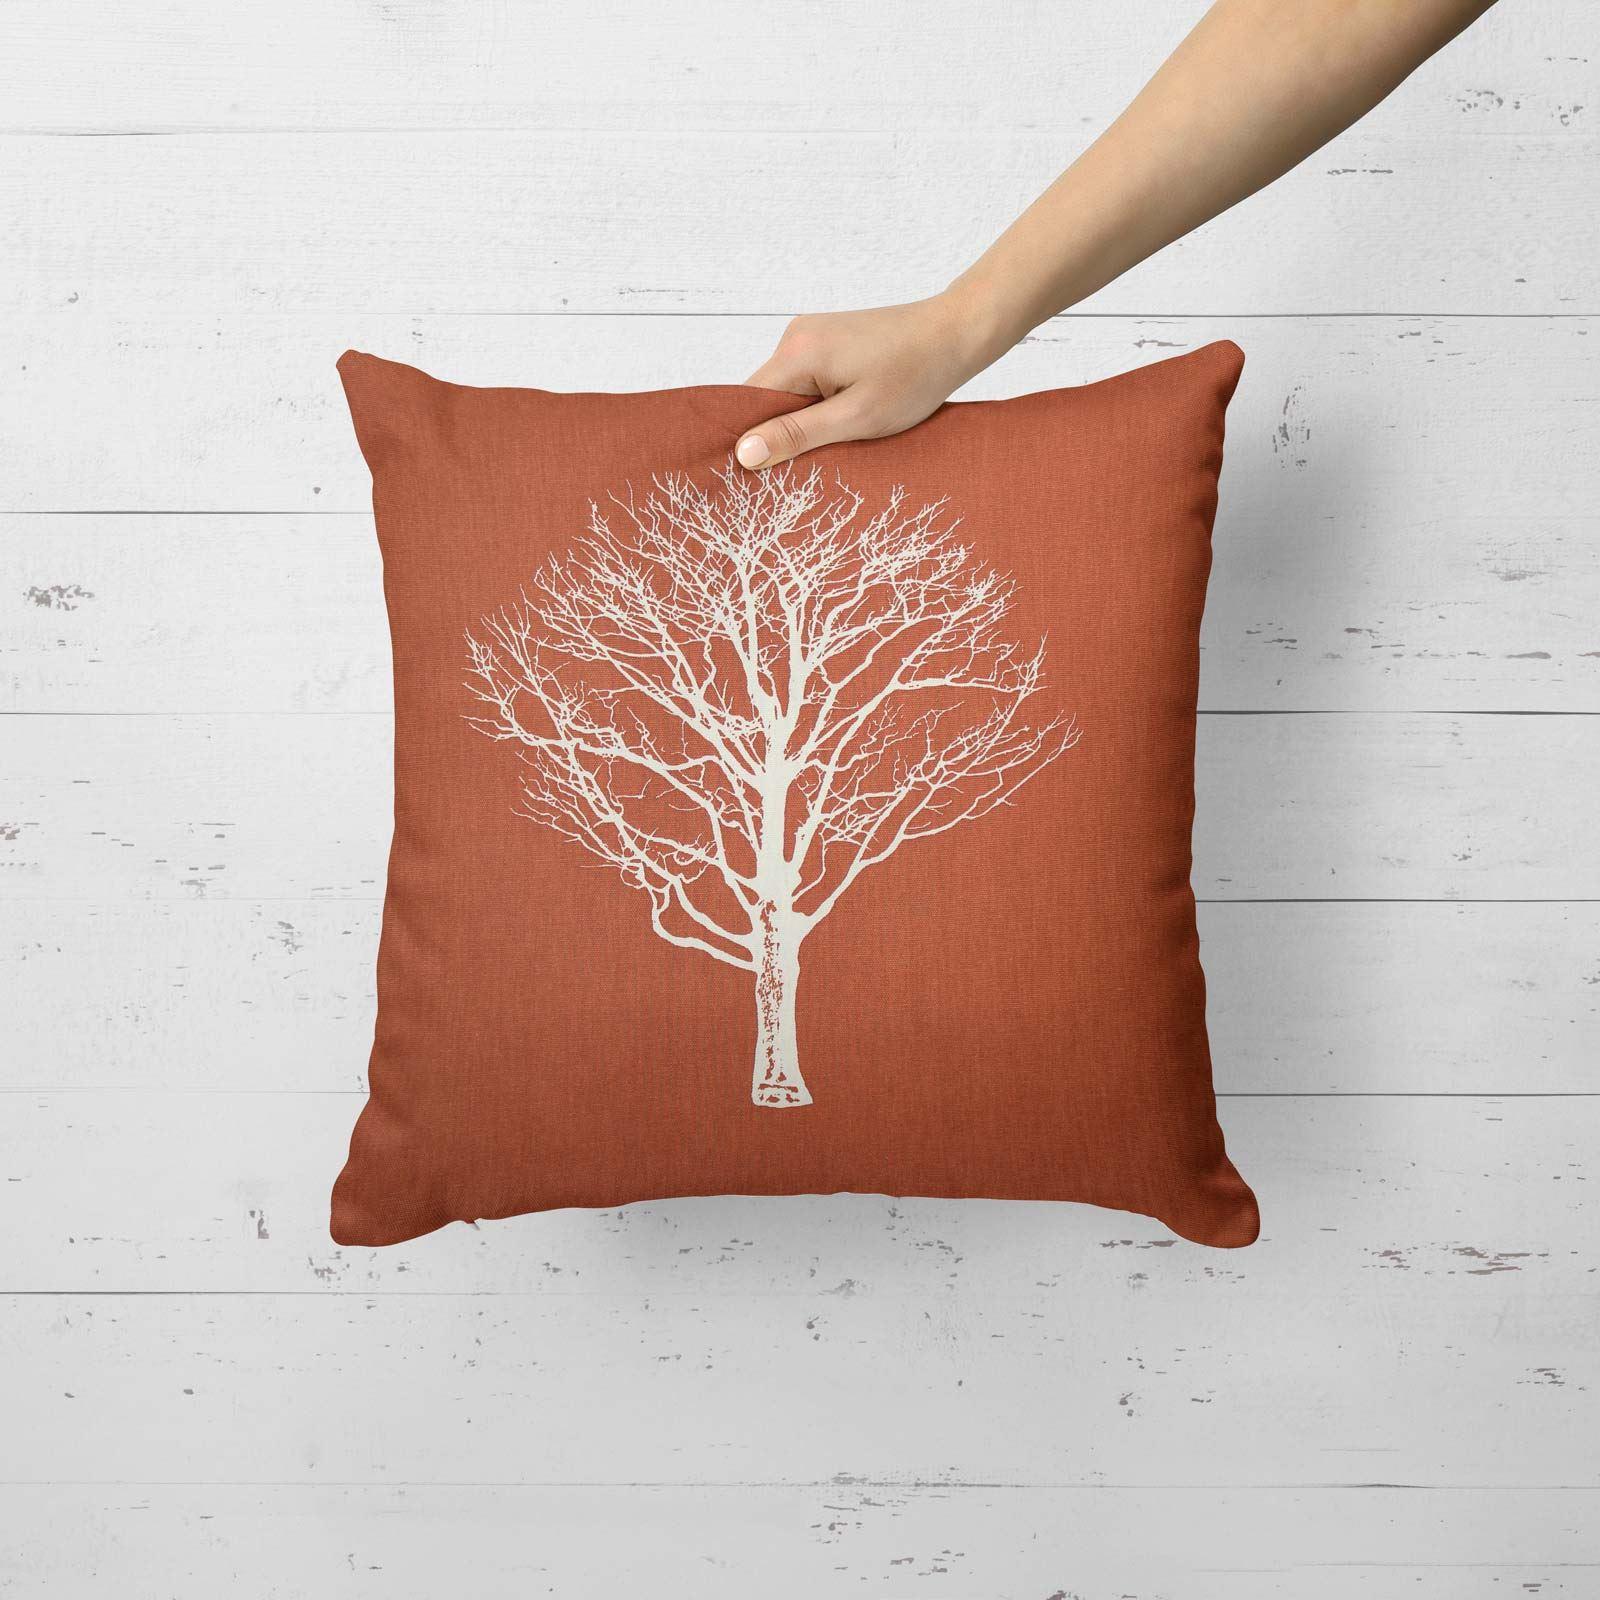 Woodland-Trees-Cushion-Cover-Modern-Reversible-Tree-Print-Covers-17-034-x-17-034 thumbnail 14